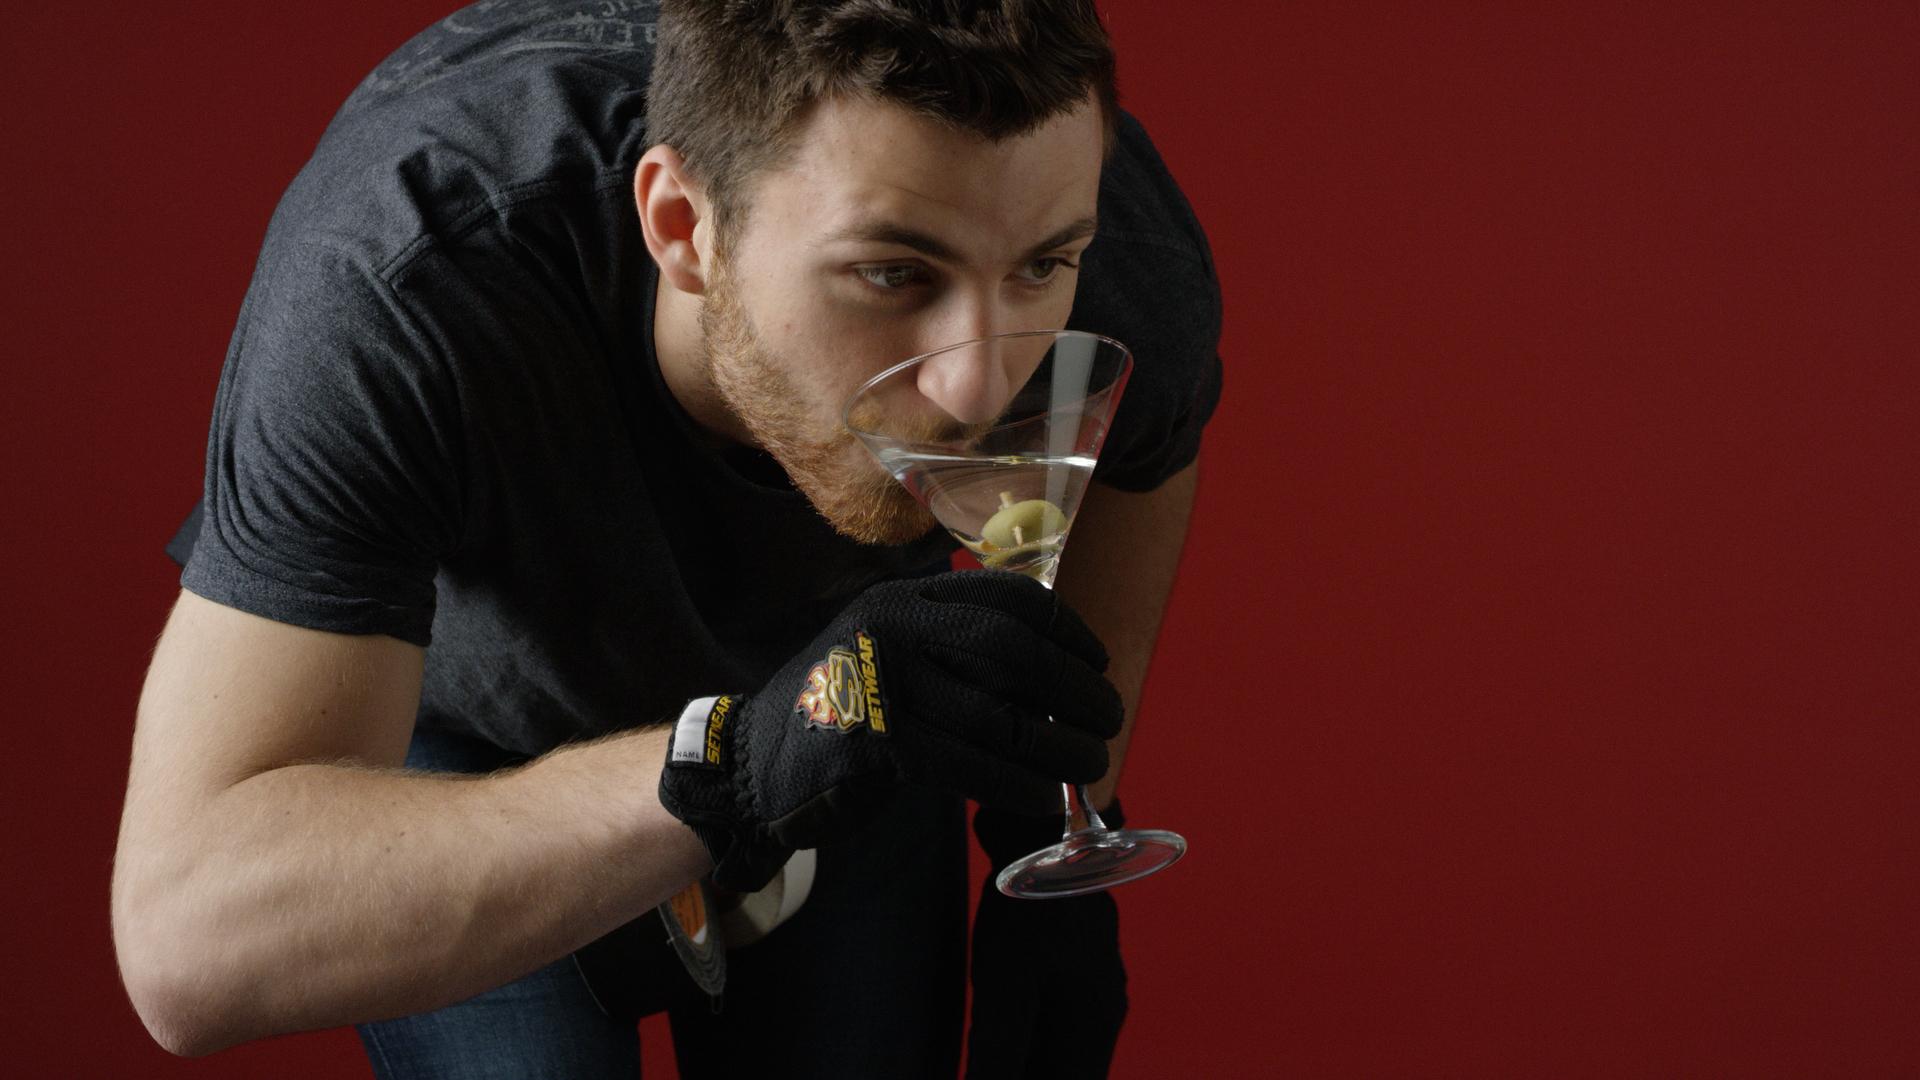 martini-shot-blog.jpg